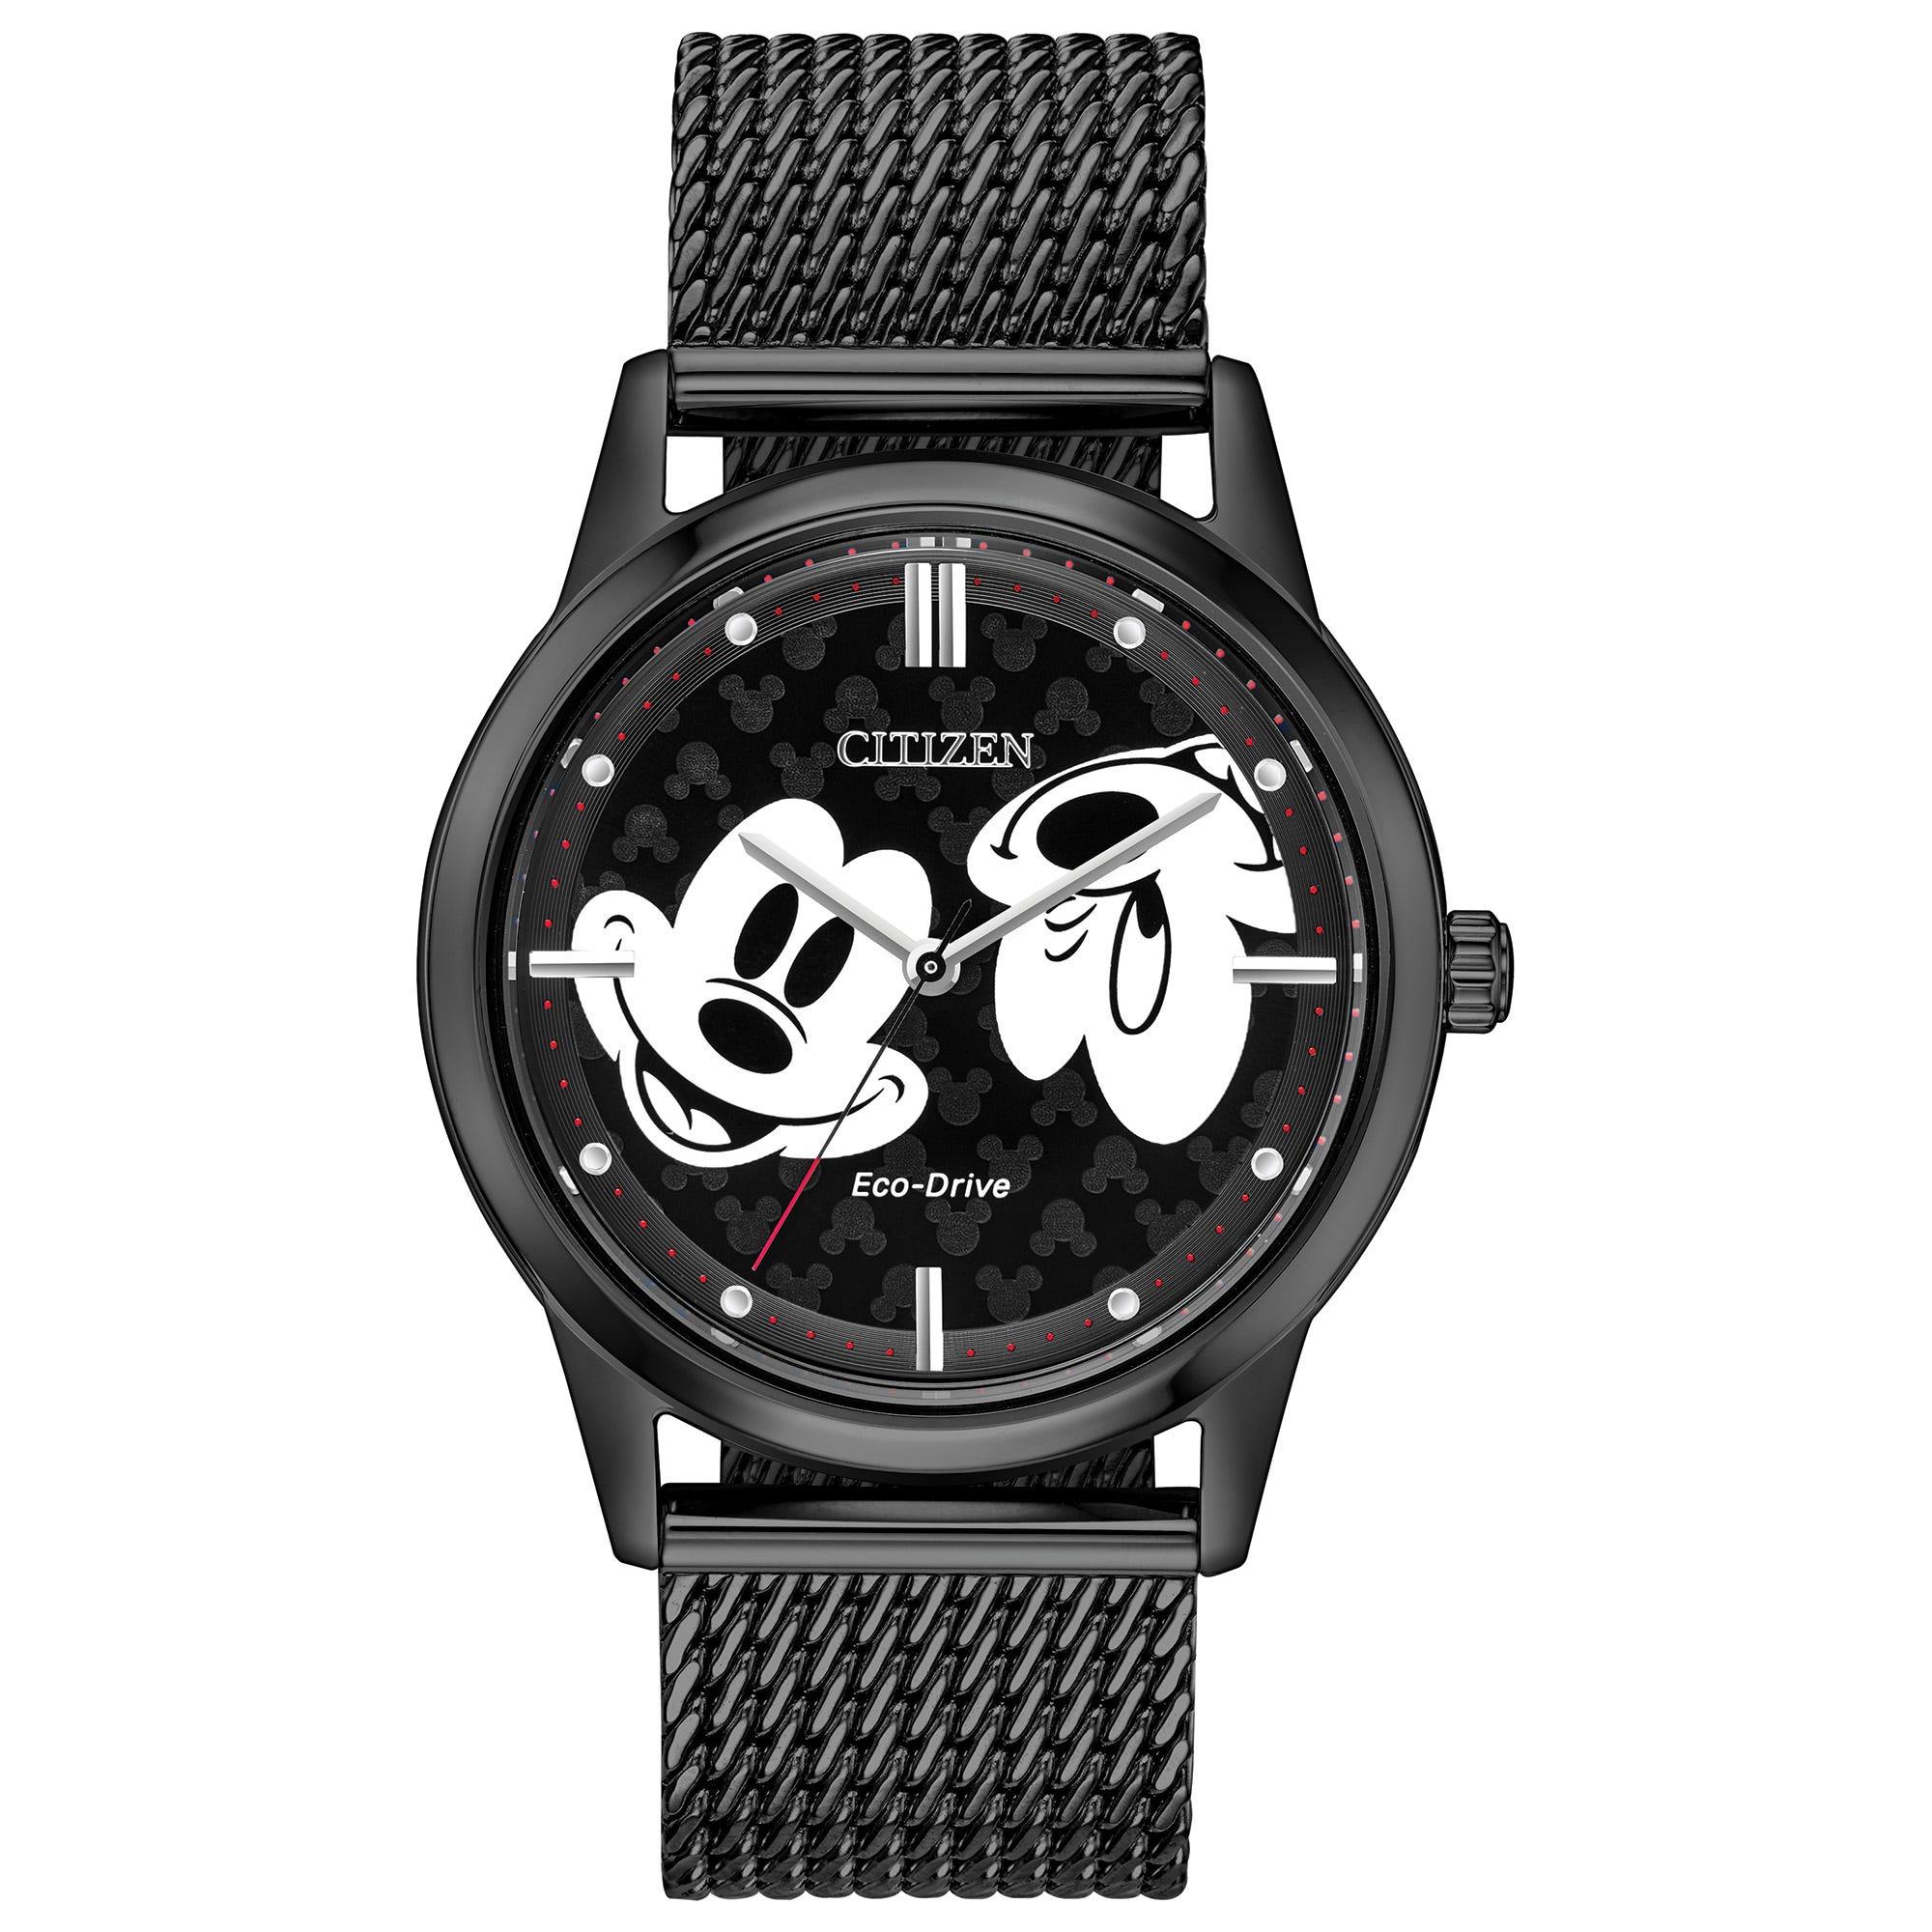 Citizen Unisex Mickey Mouse Disney Watch FE7065-52W